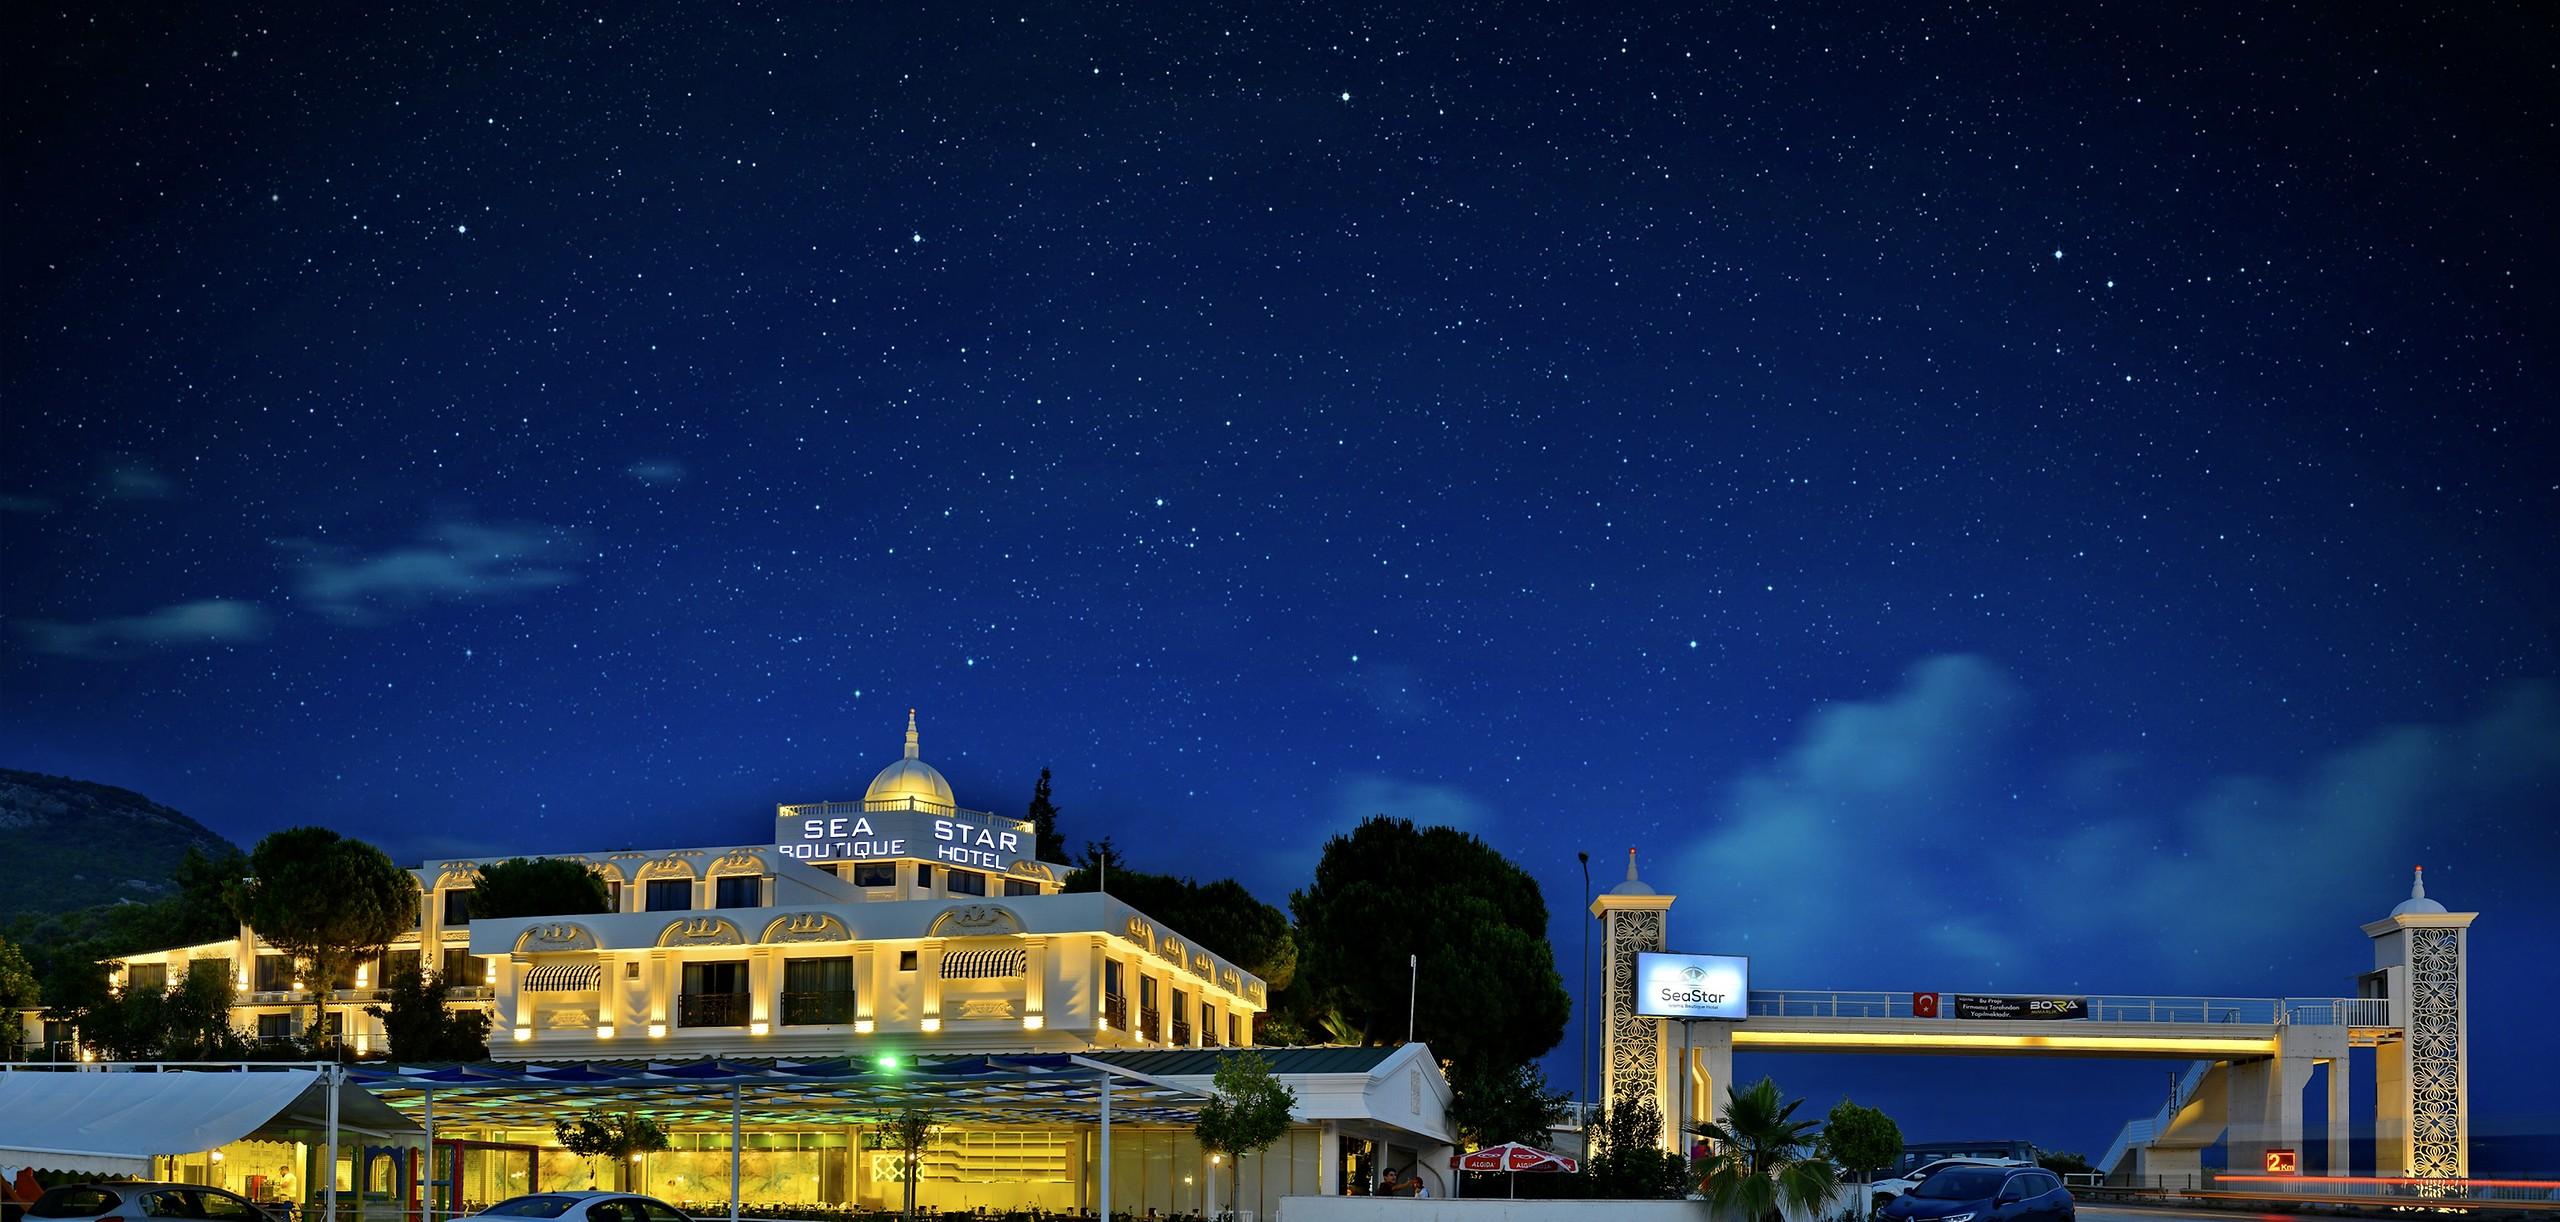 SEA STAR HOTEL261955